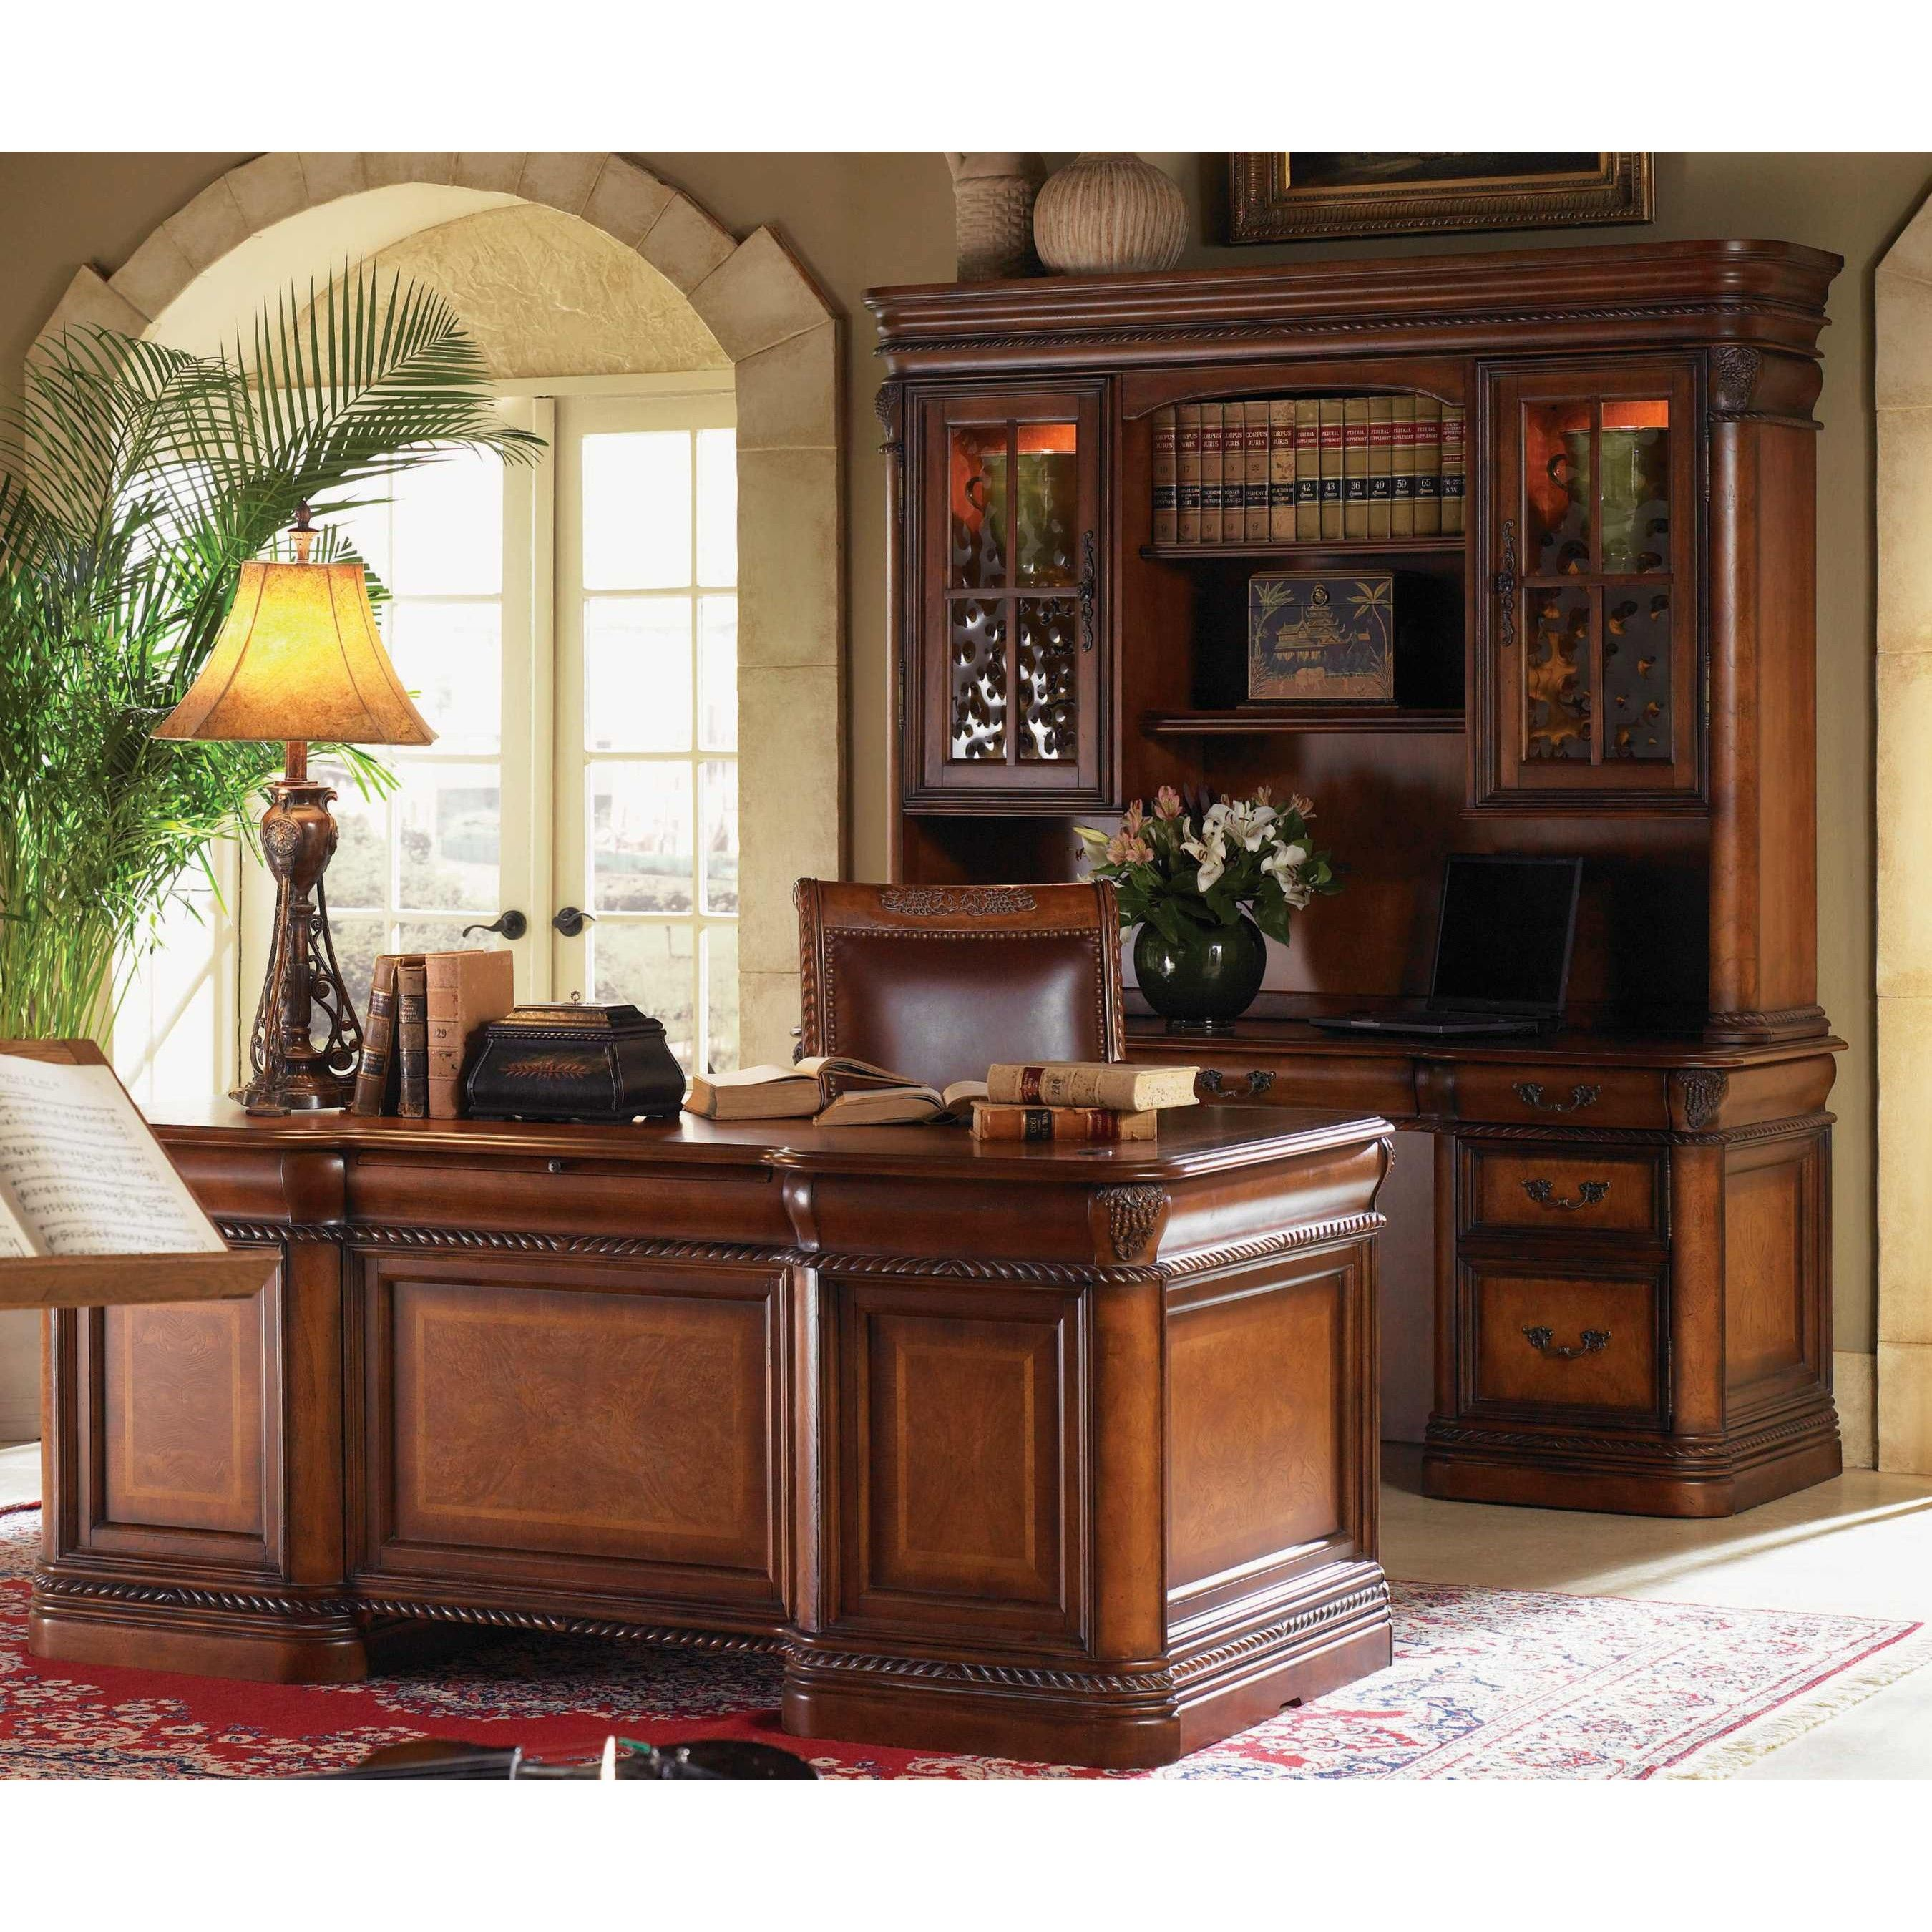 124 best Home Furniture images on Pinterest